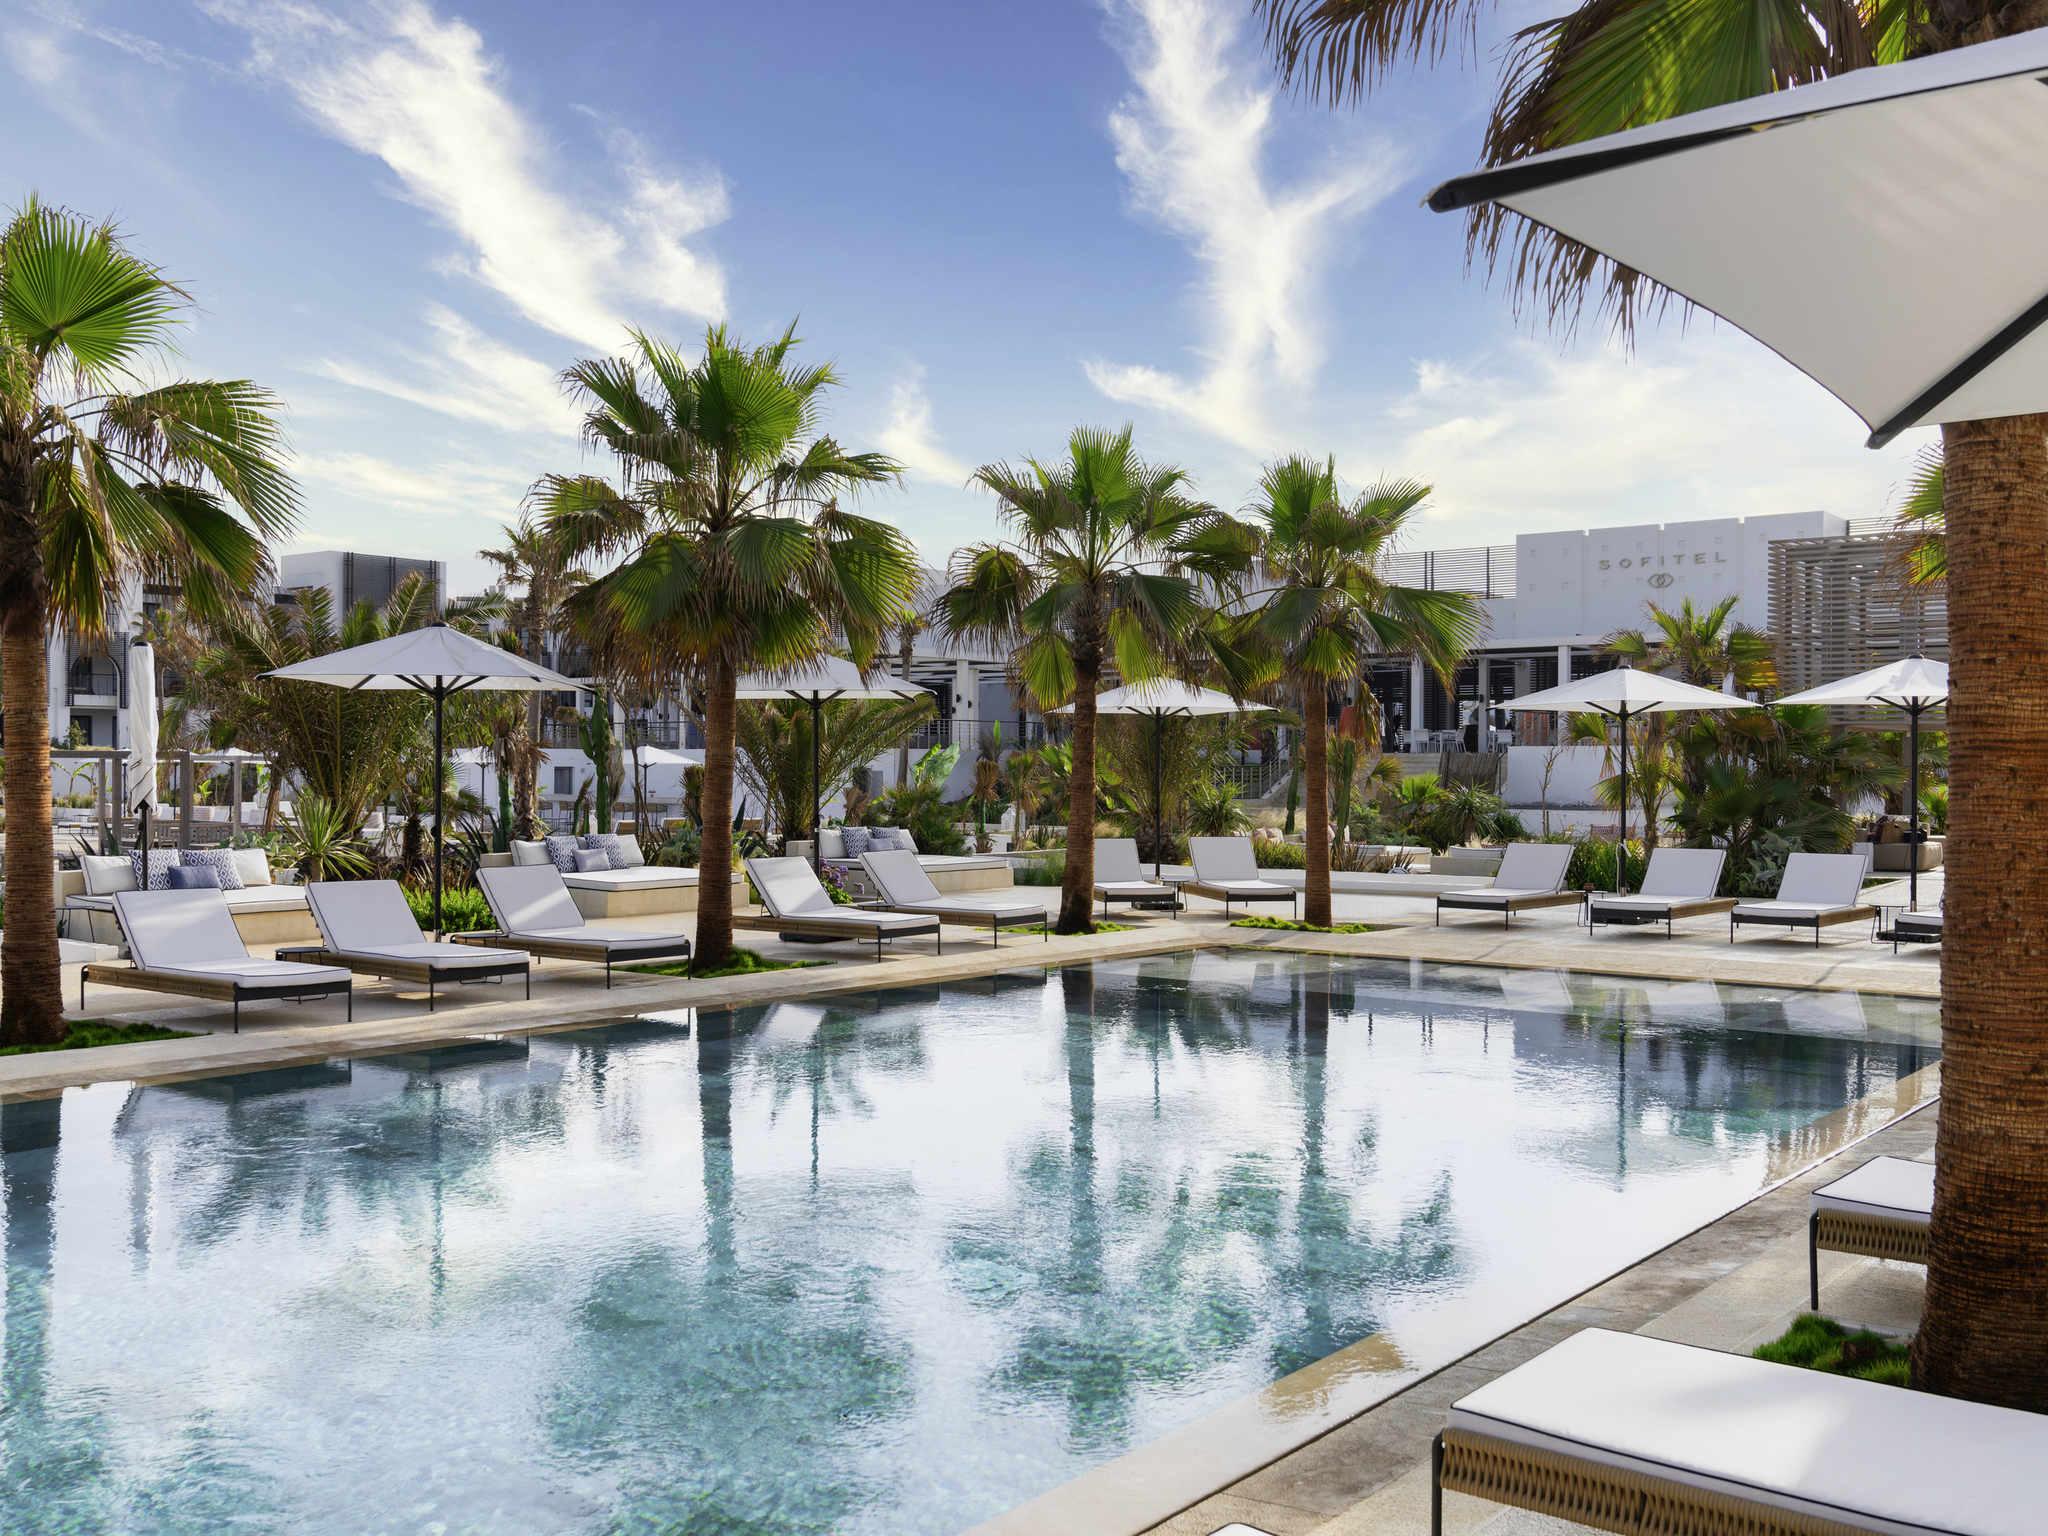 Hotel in Agadir - Sofitel Agadir Thalassa sea & spa - AccorHotels